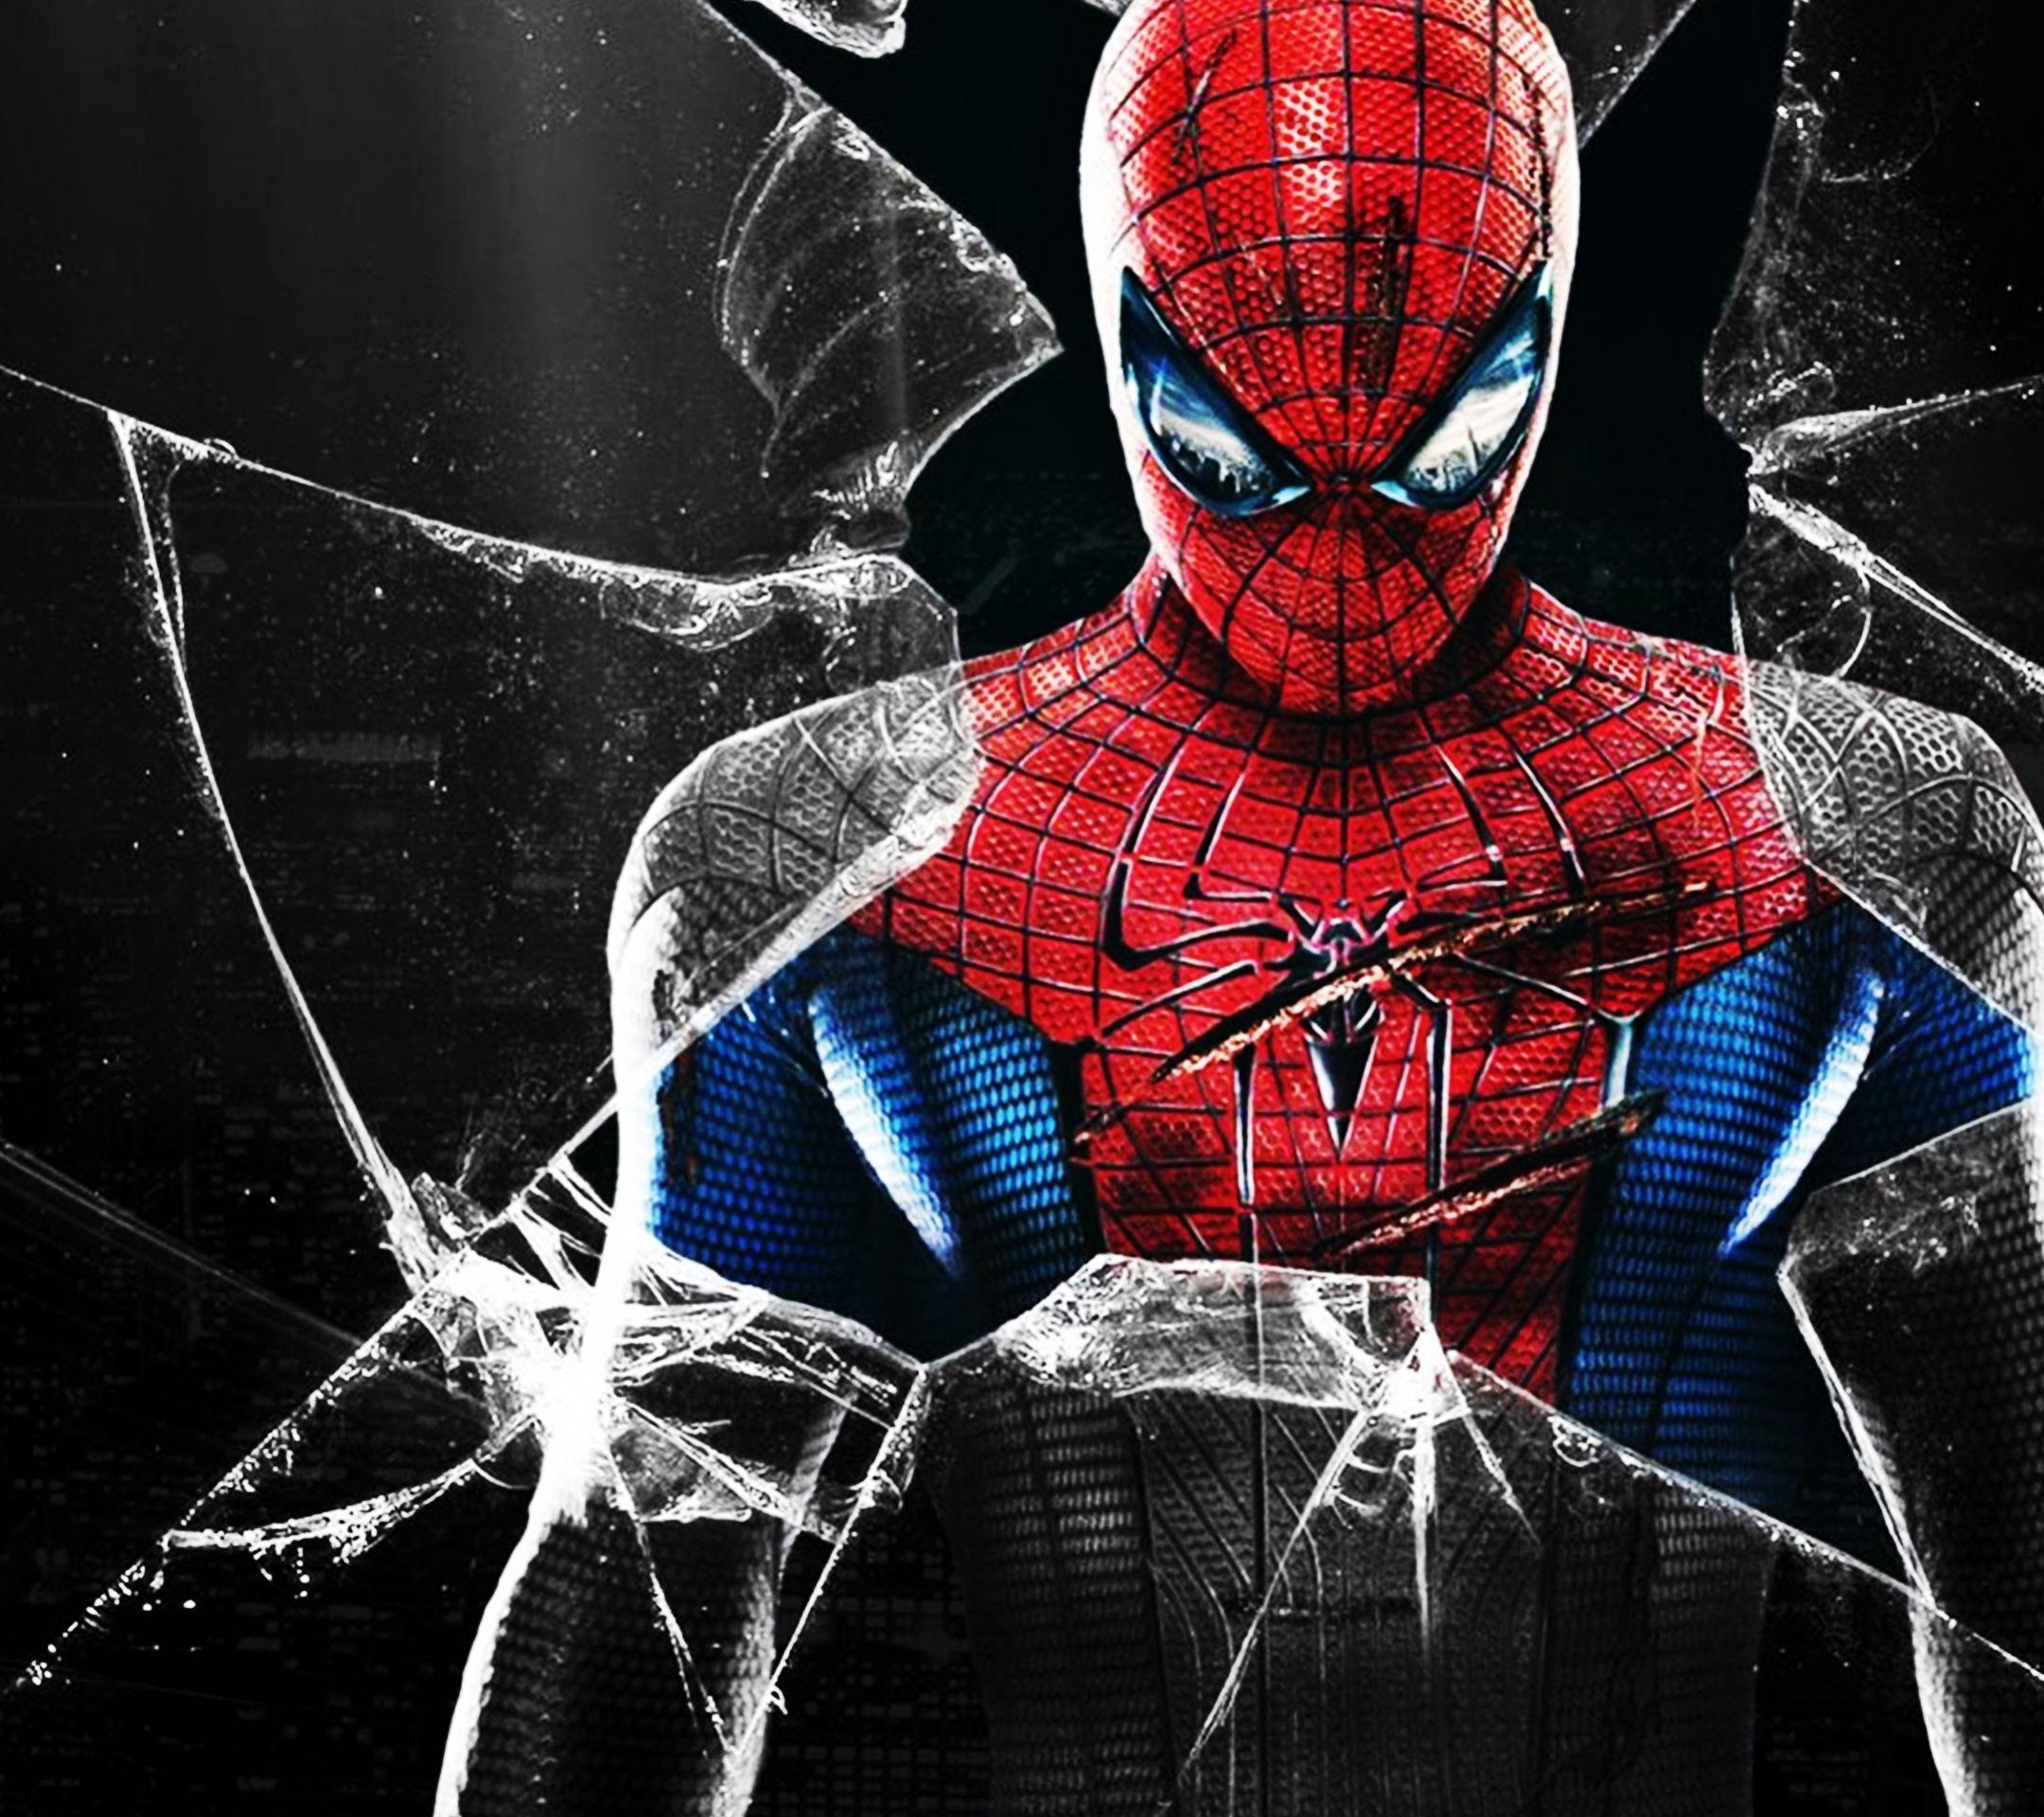 Download Wallpaper Home Screen Spiderman - 1ae9681943b616fc31f61c53863fa3ff  Photograph_44922.jpg